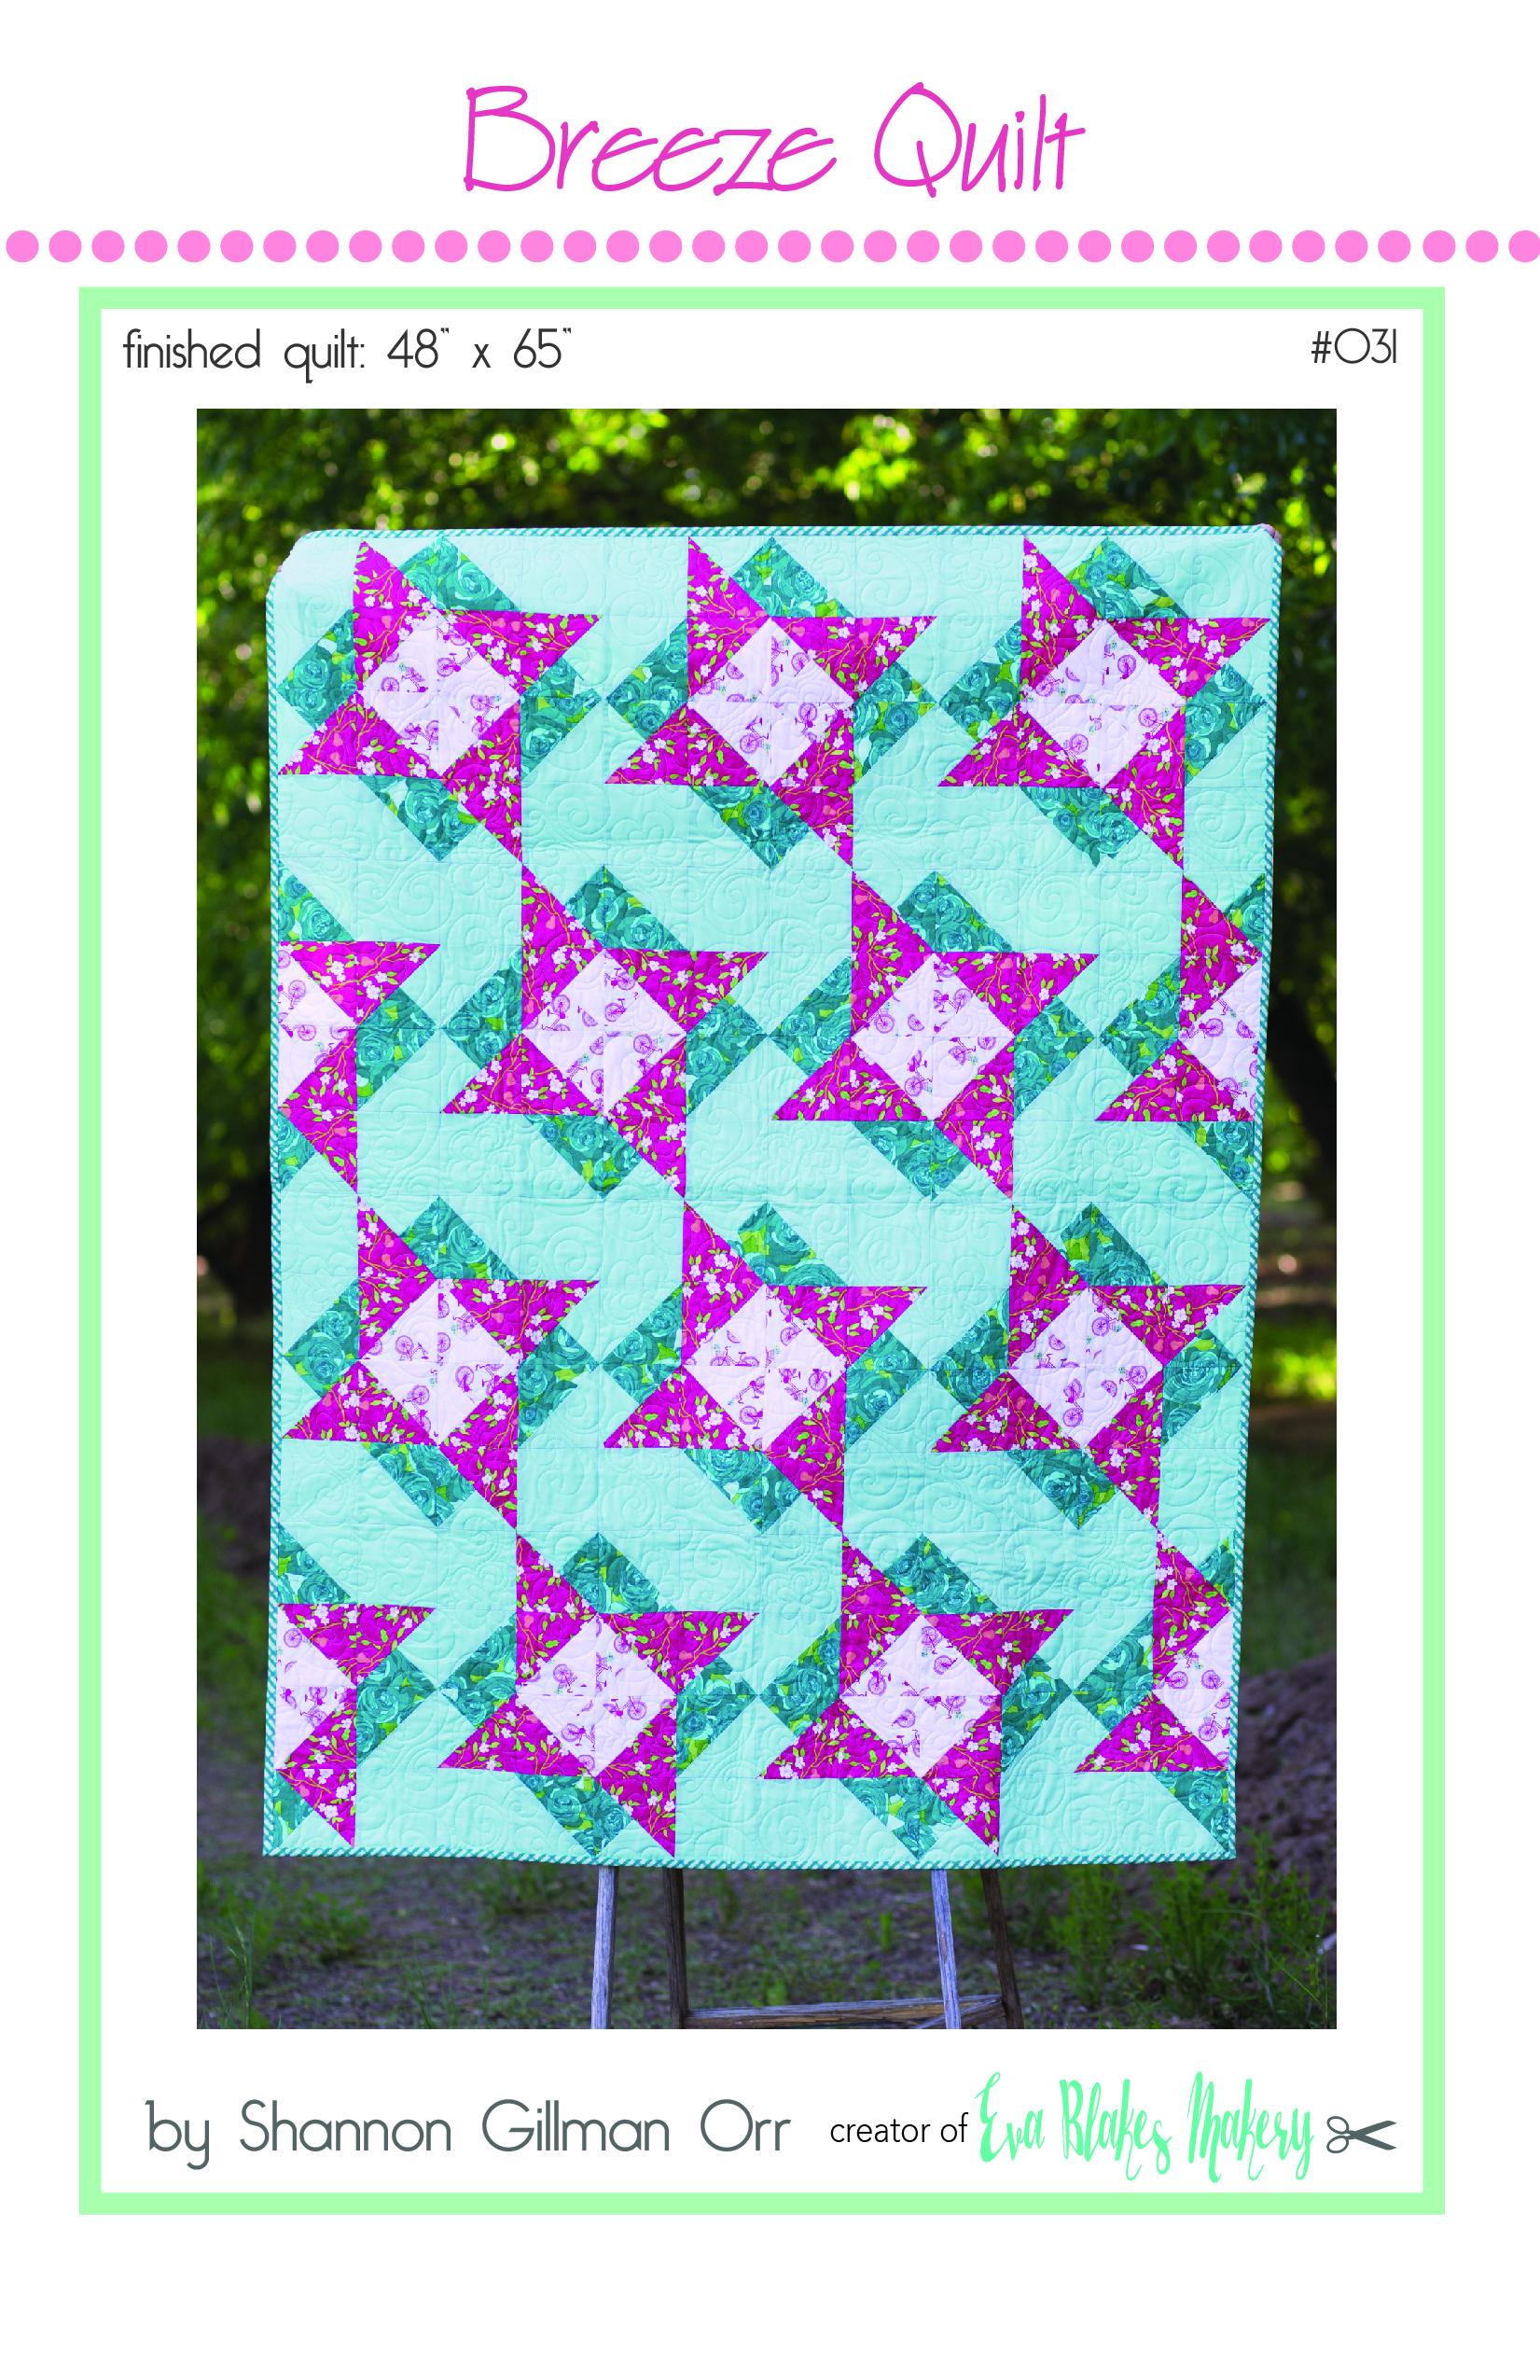 Breeze Quilt_Artboard 1.jpg